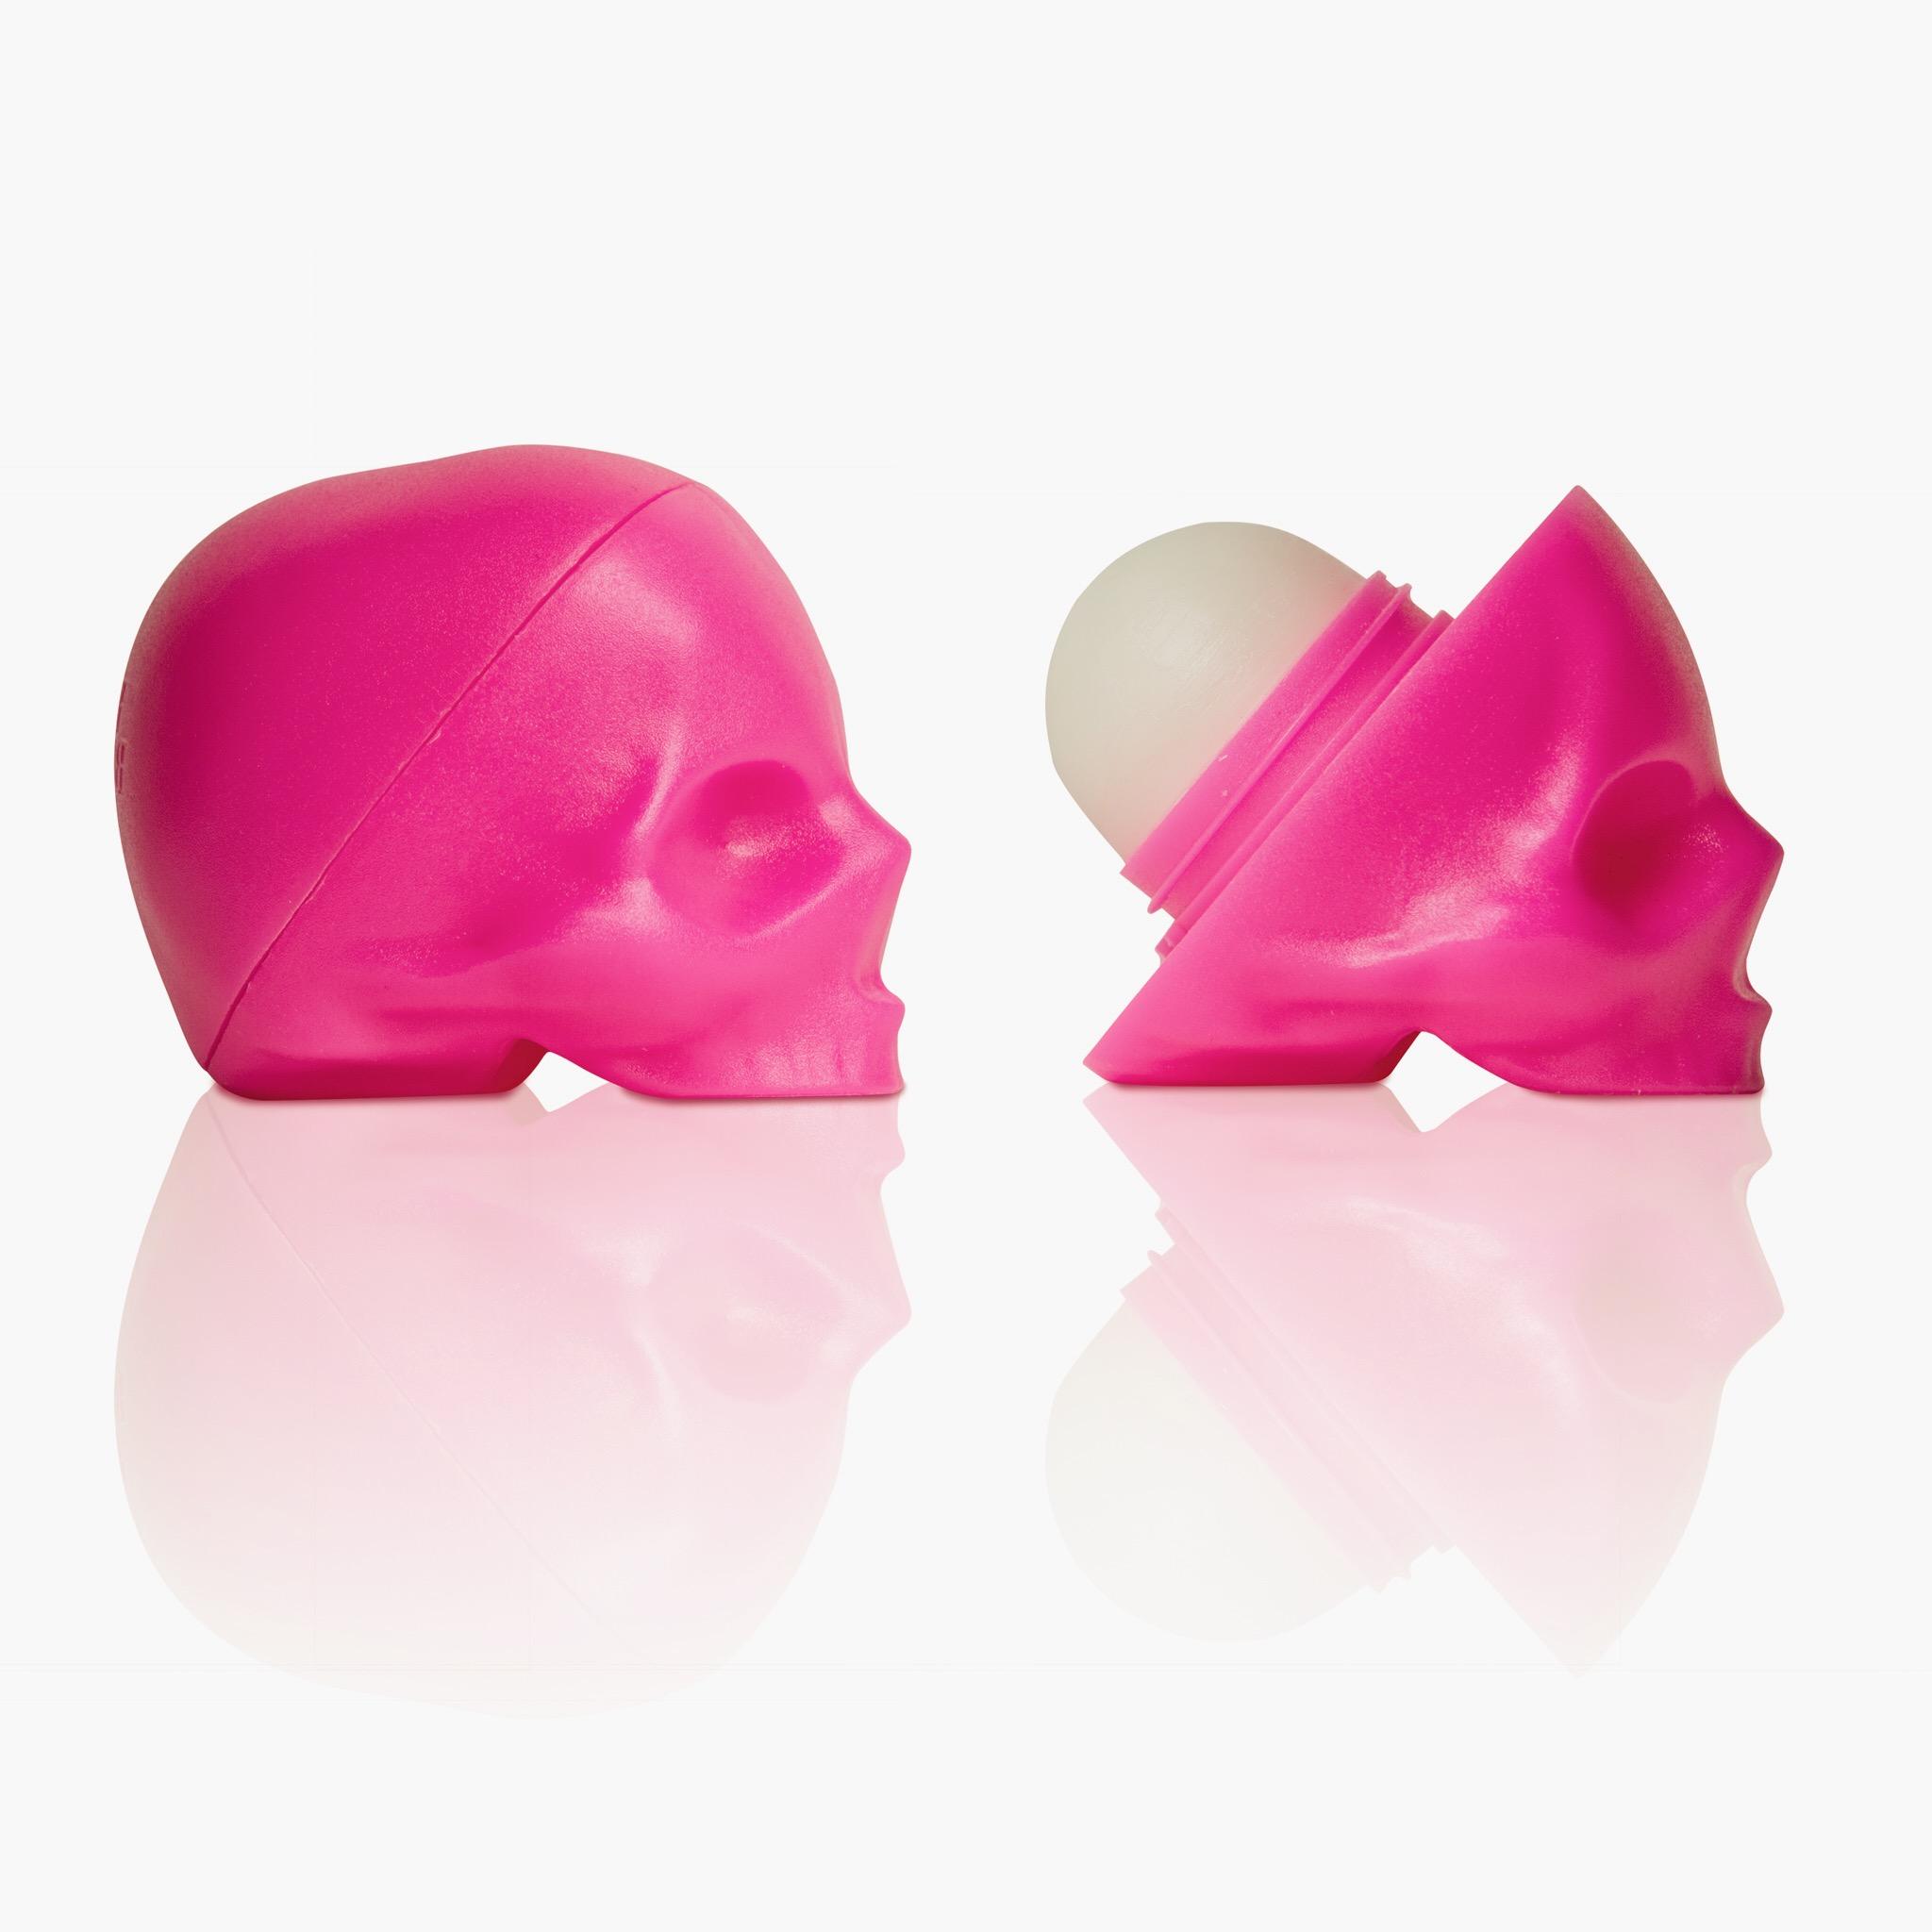 Pink Balm 2 shot (002).JPG